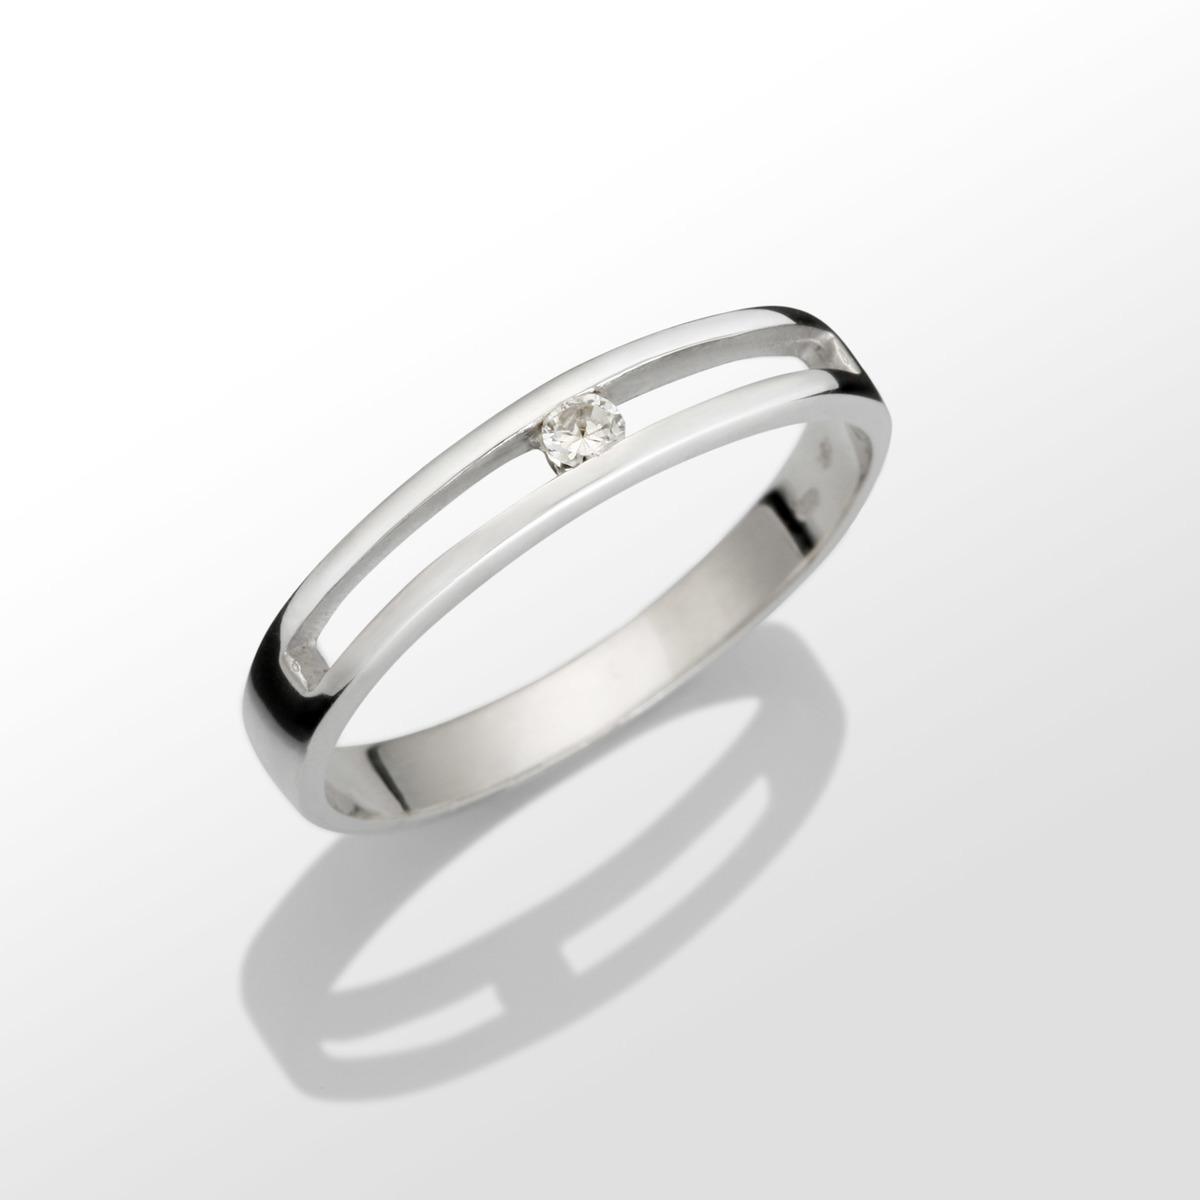 Prsten z bílého zlata Au 585 1000 s briliantem - Red and Cube 028d418598a